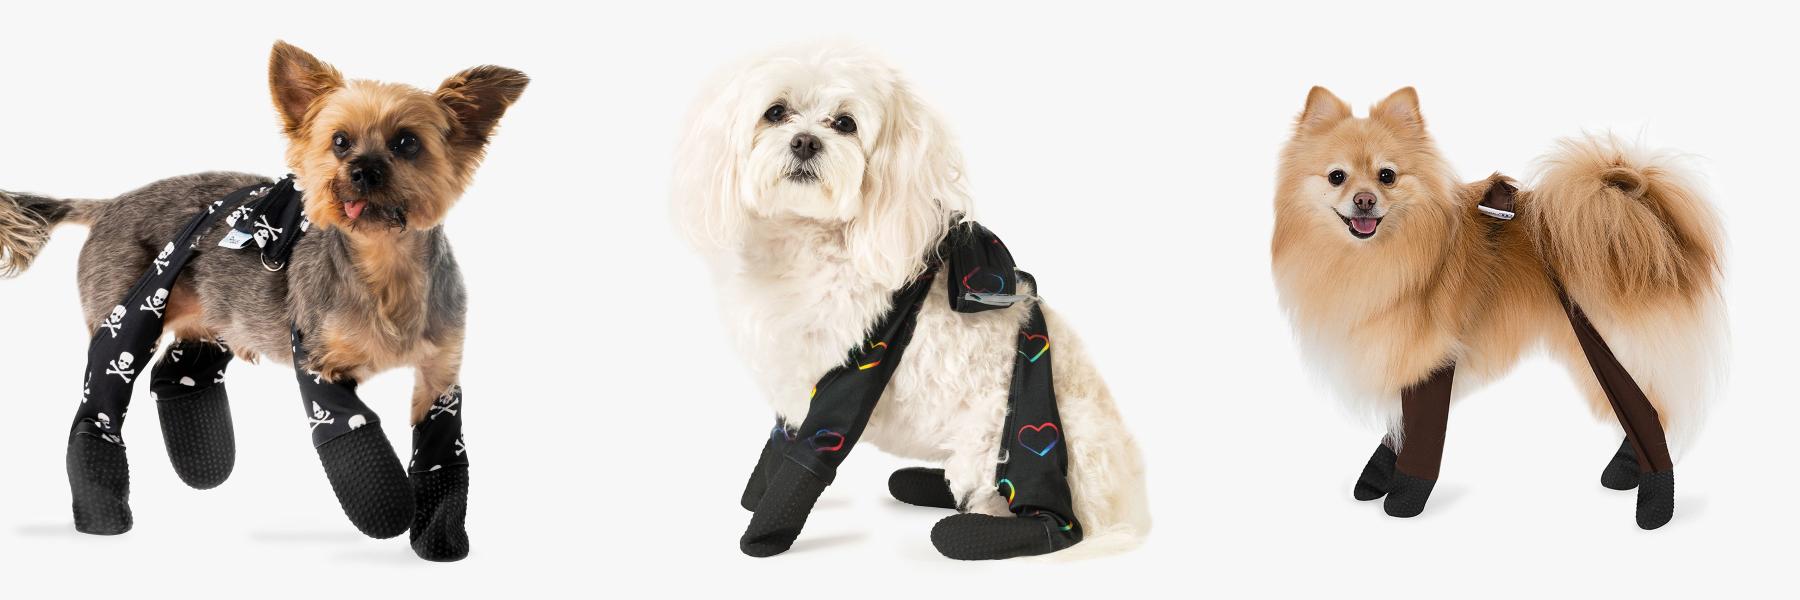 Walkee Paws Dog Leggings - Different Patterns